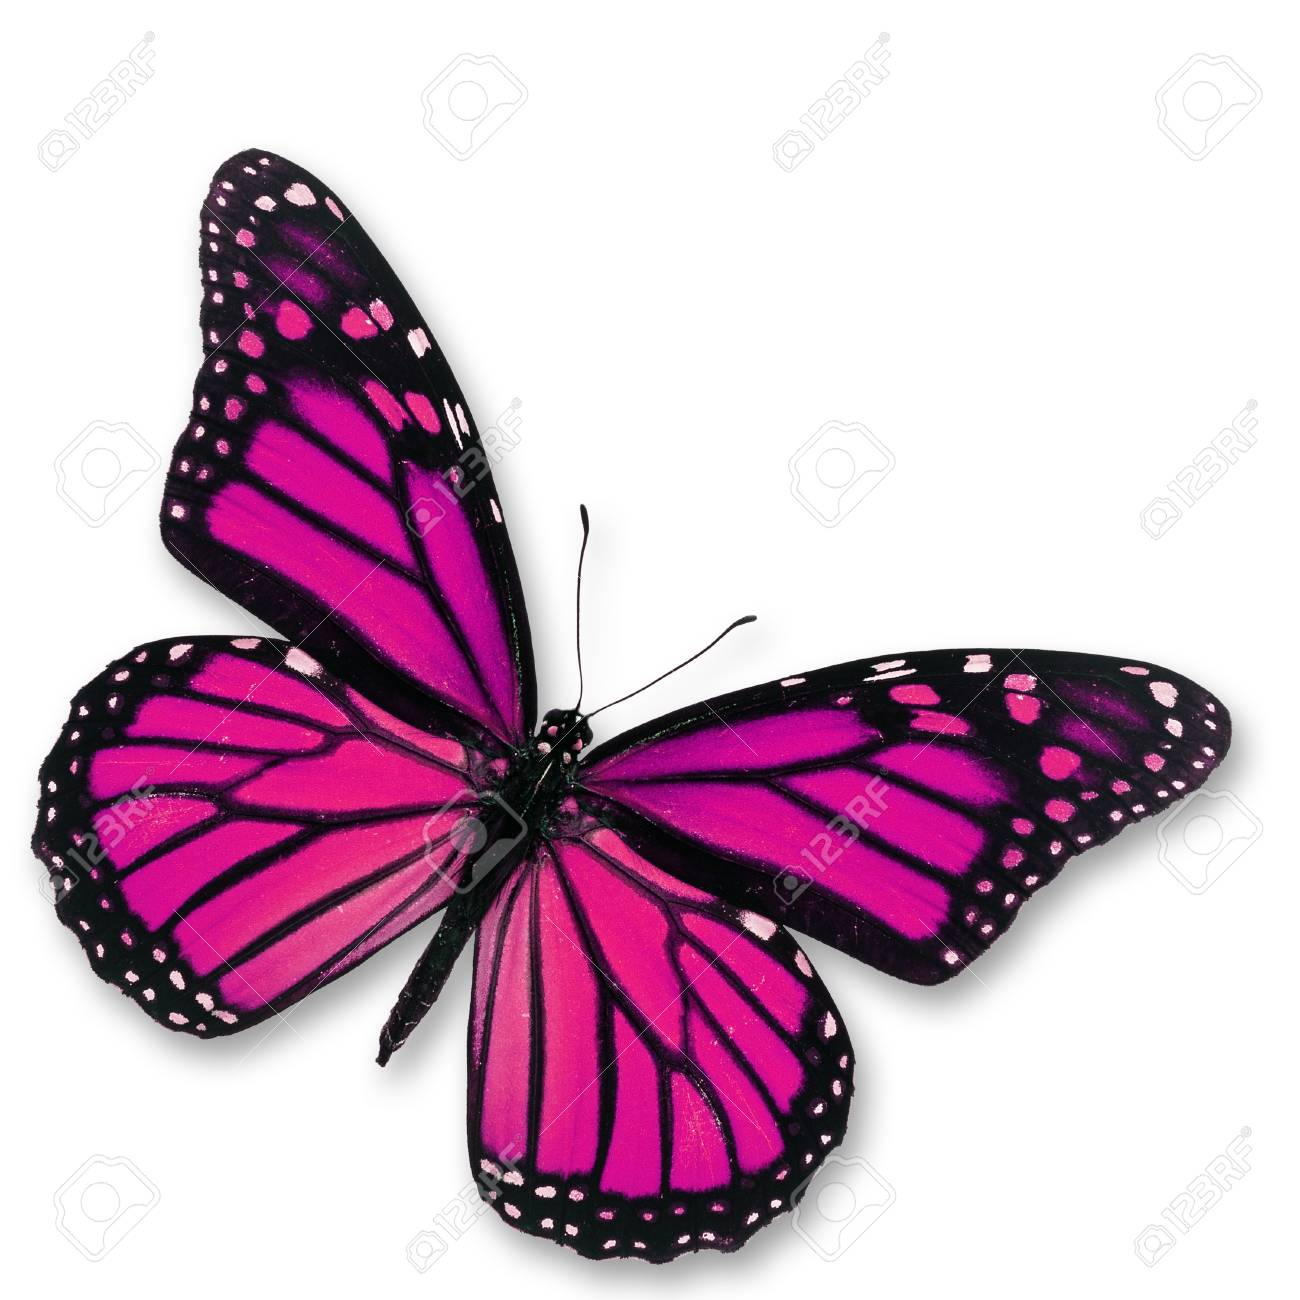 33425457-roze-vlinder-die-op-witte-achtergrond-wordt-ge%C3%AFsoleerd.jpg